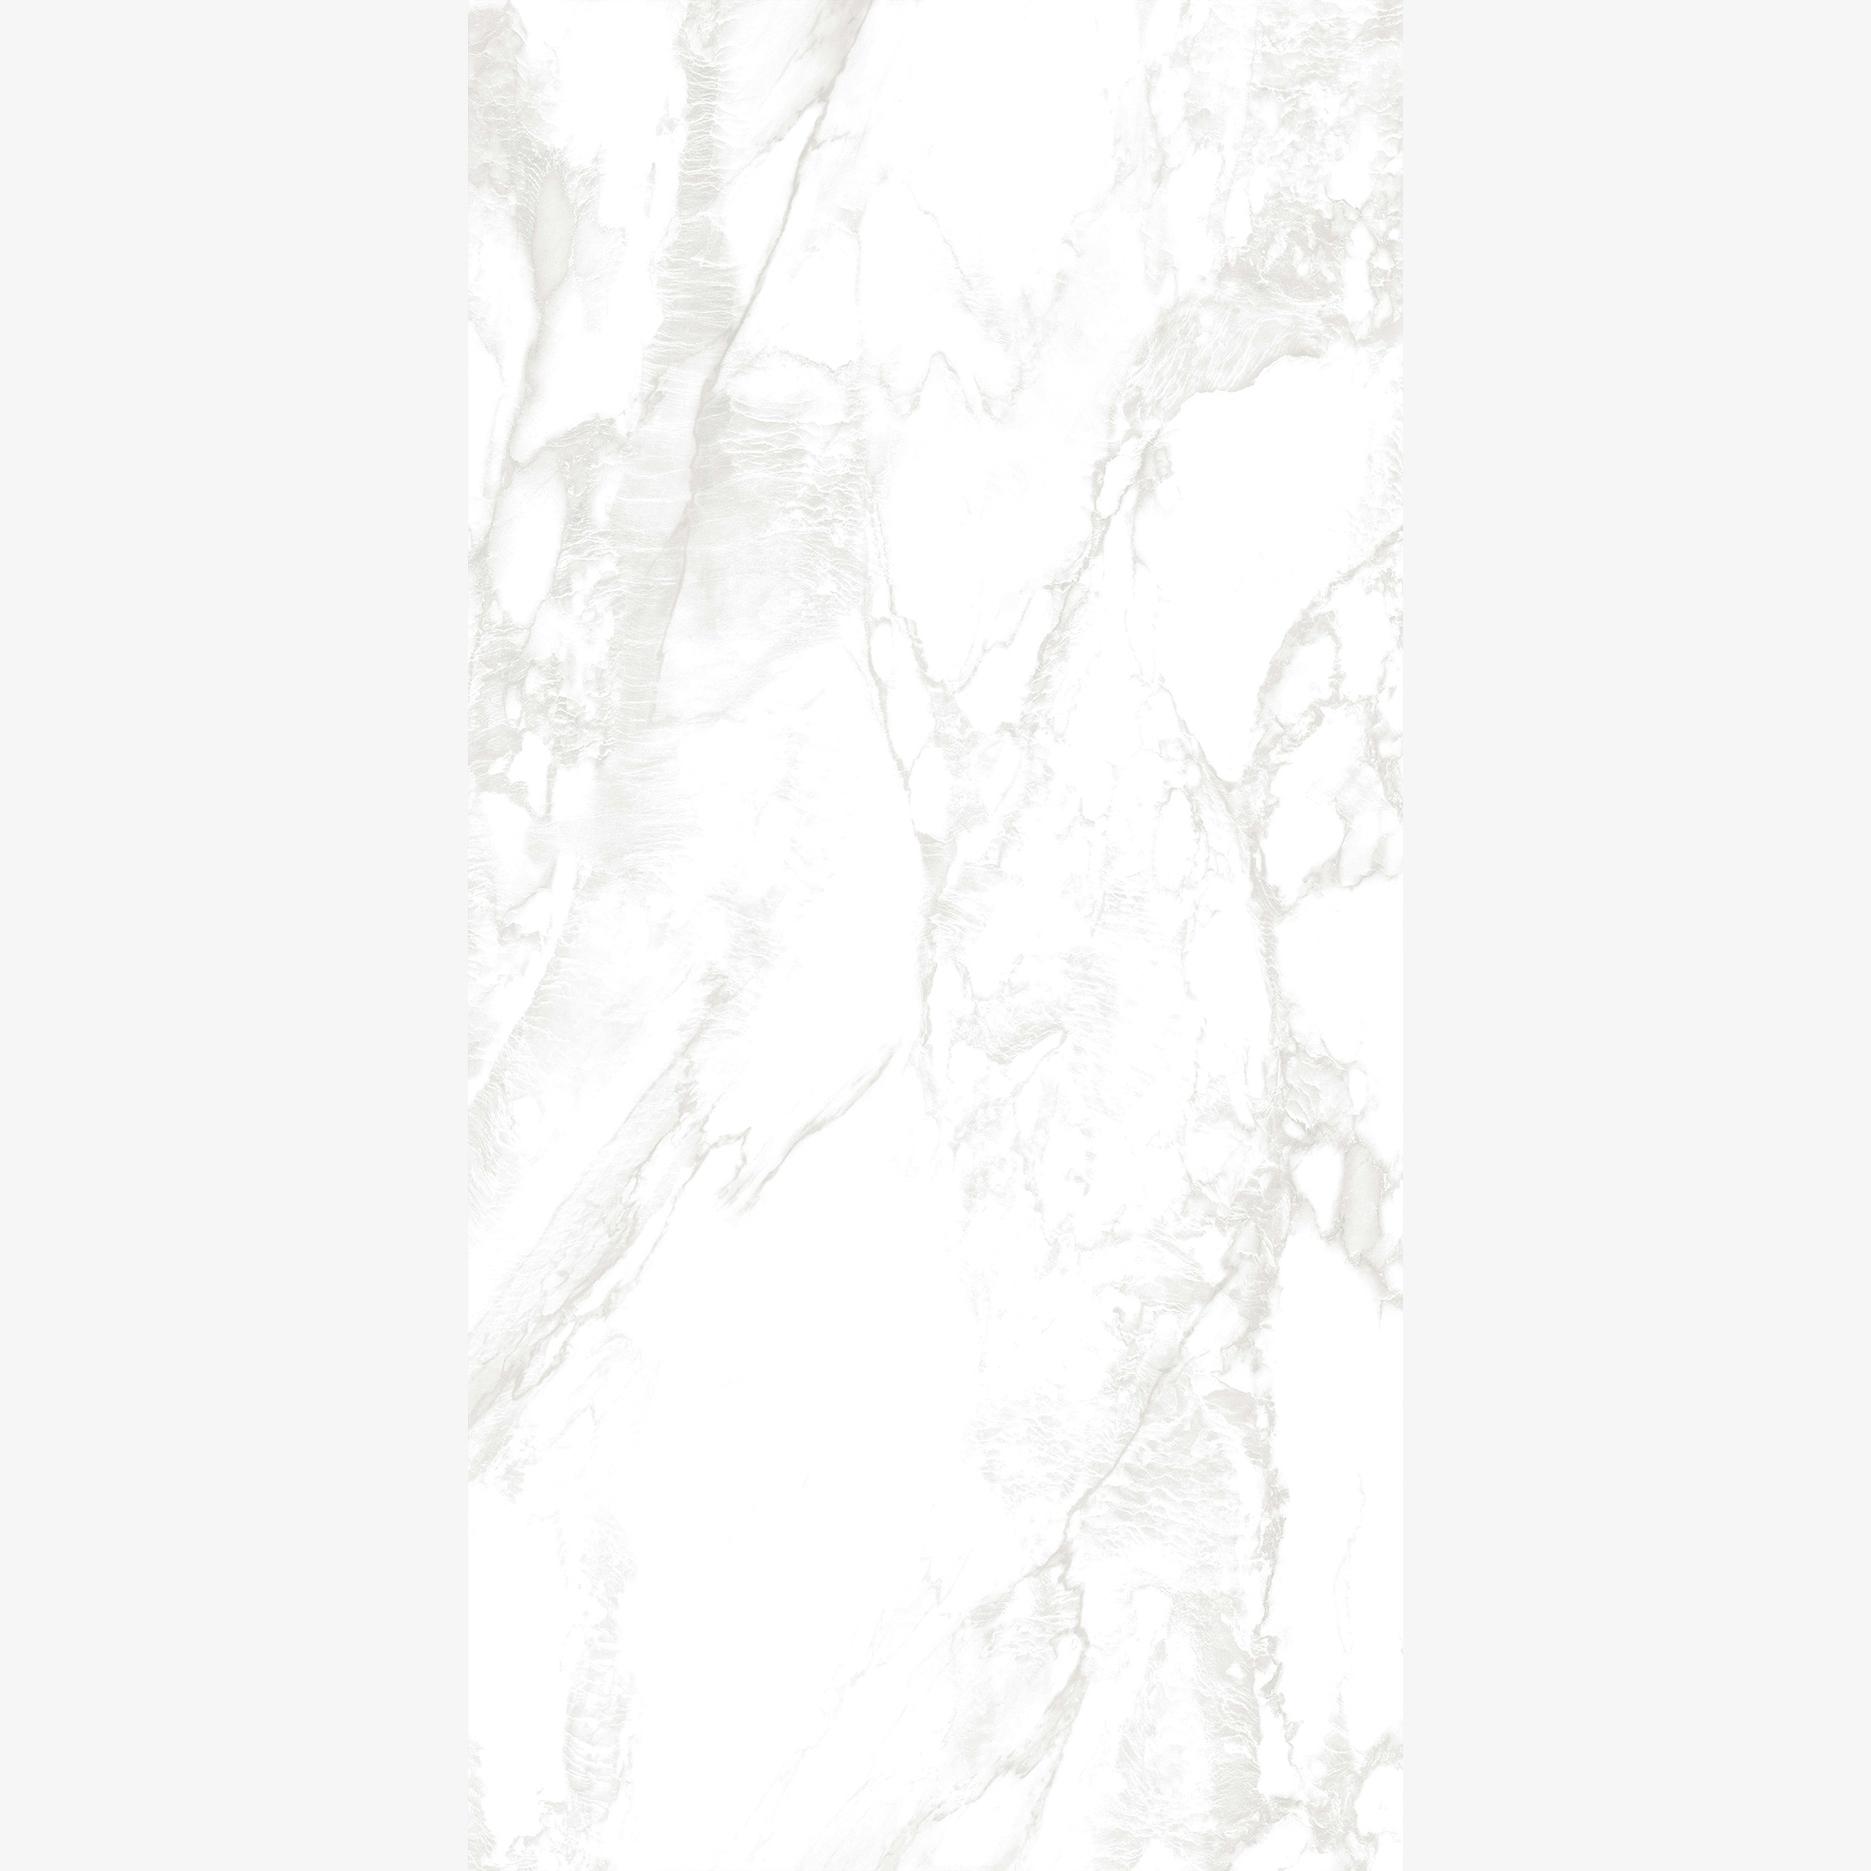 山水白 HPEG1890049,900x1800mm